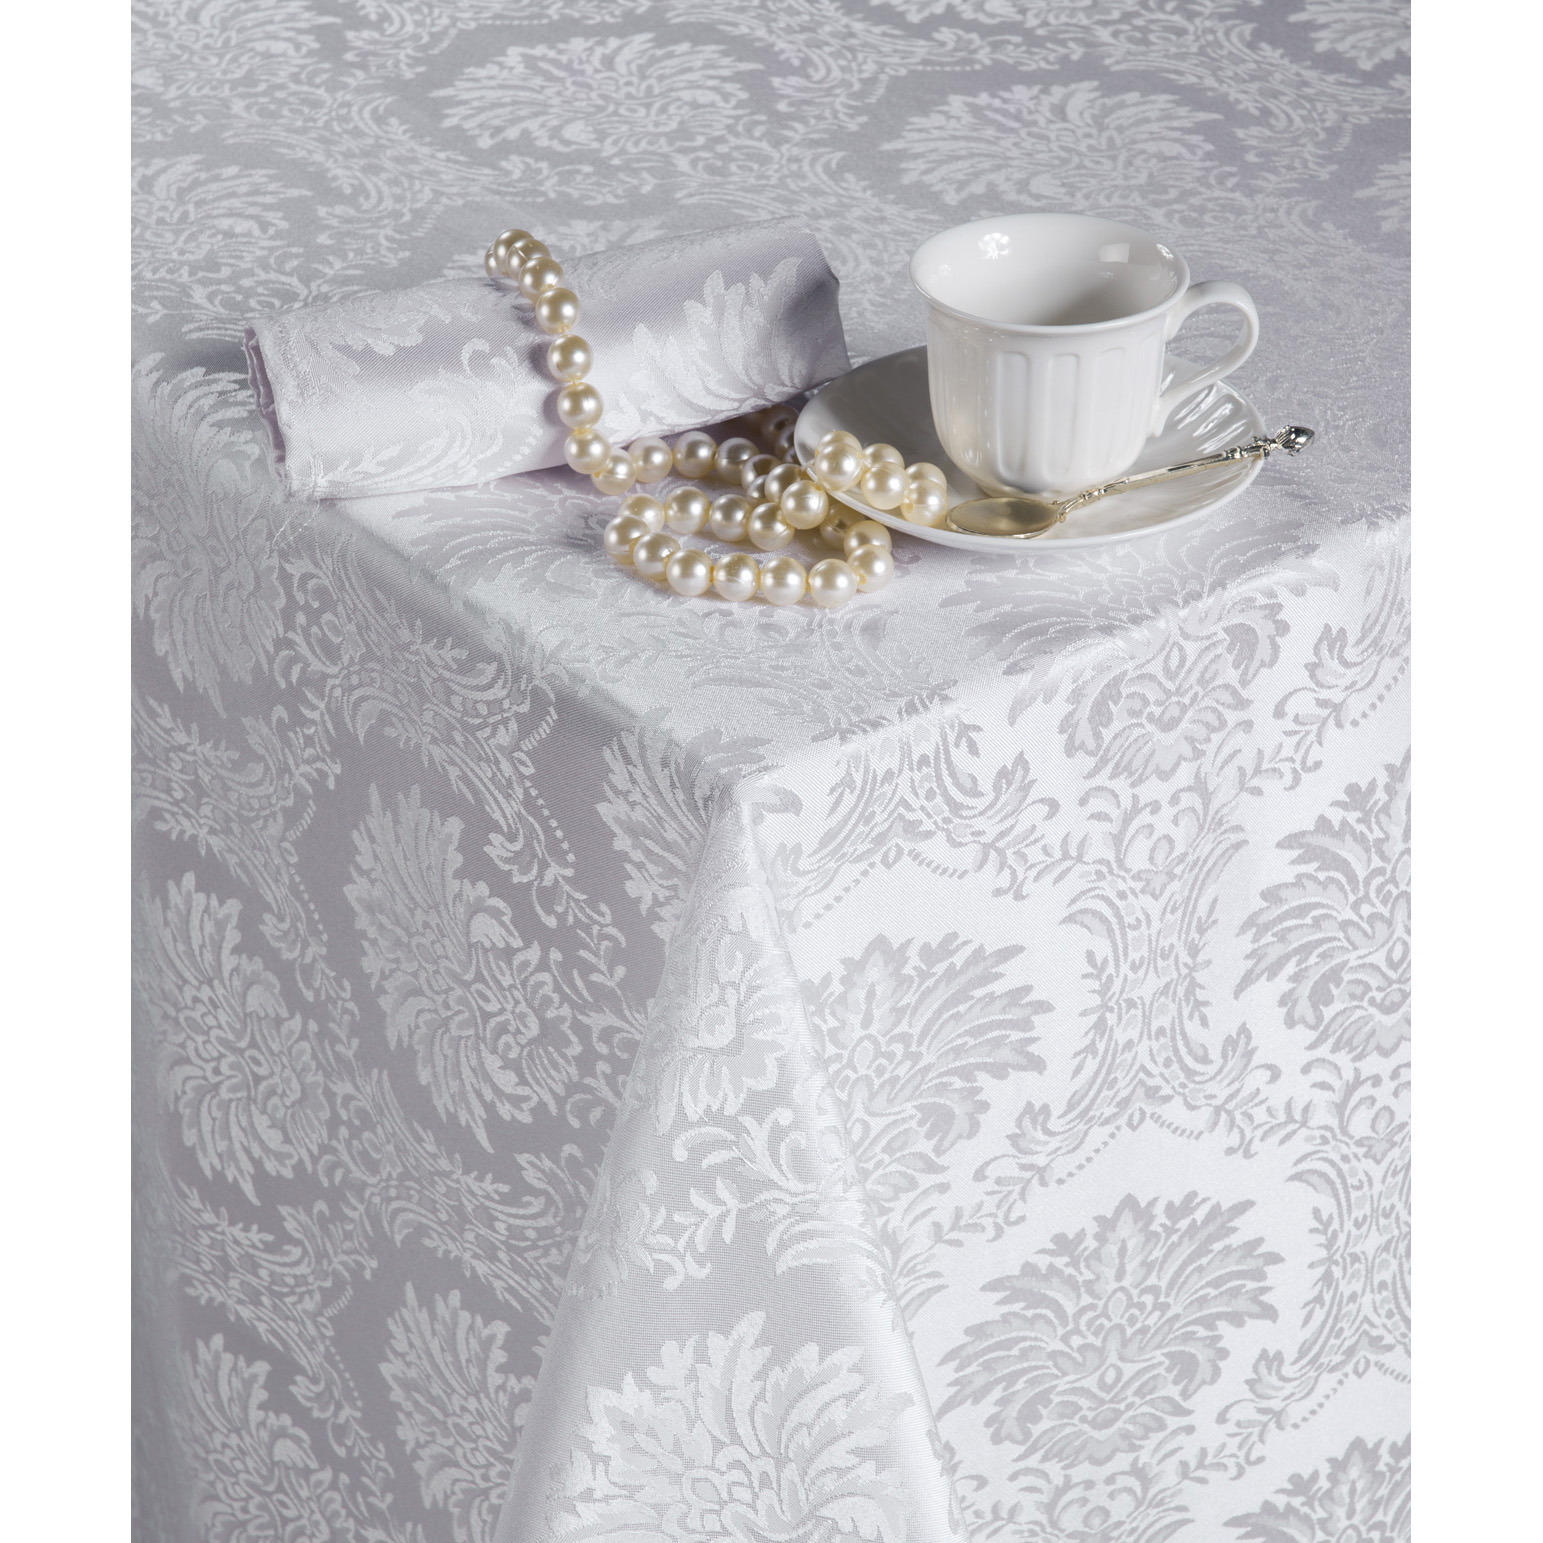 Комплект  Марисабель  Белый, размер 150х150 см - Текстиль для дома артикул: 12219